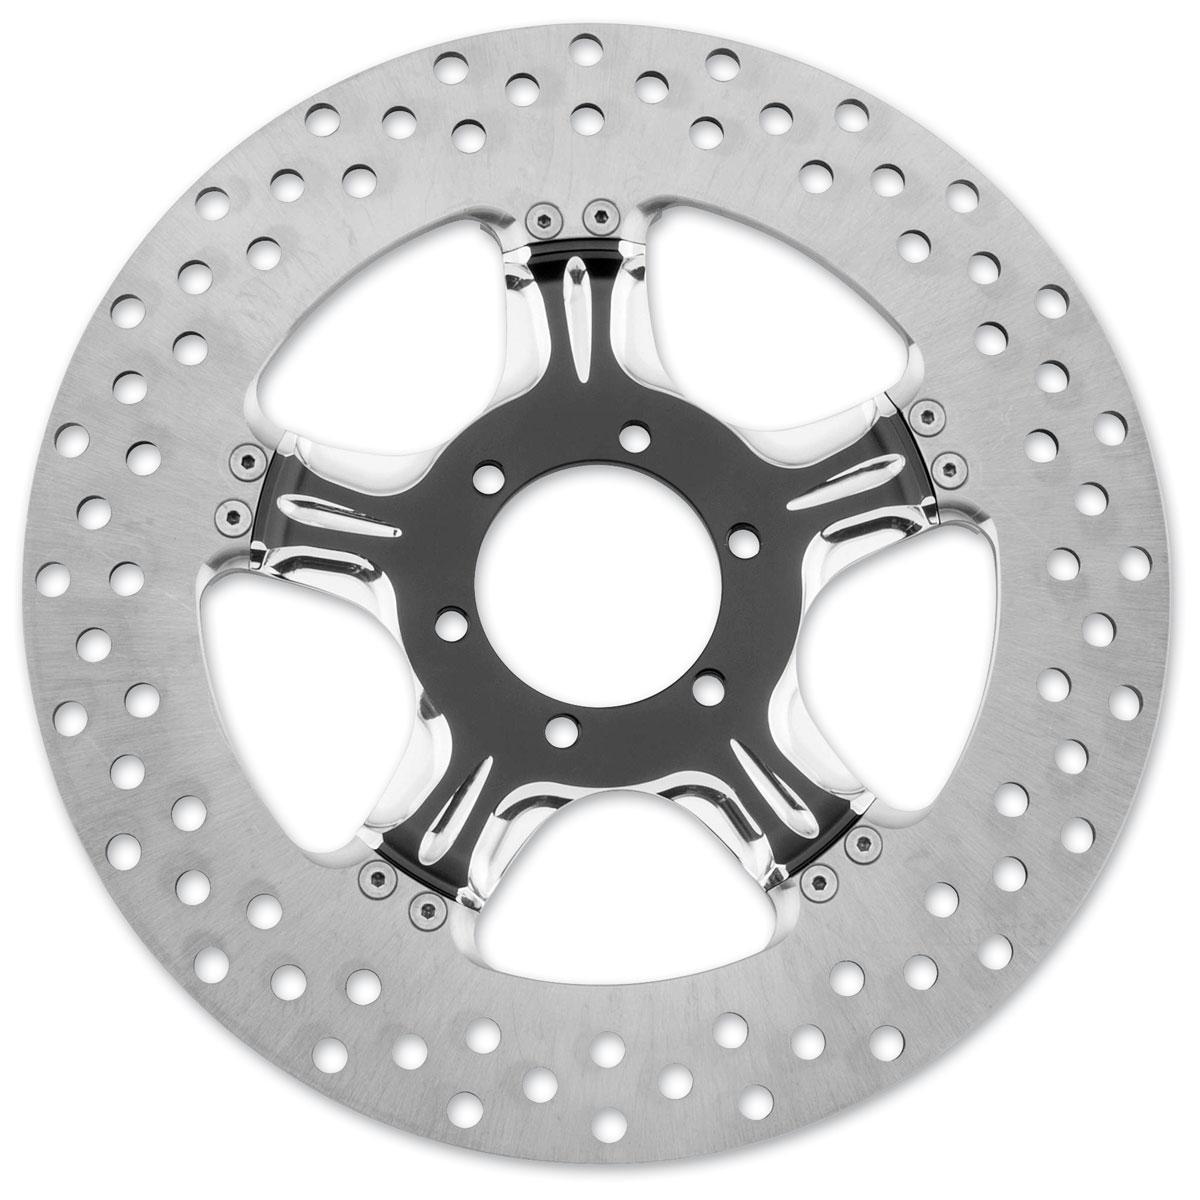 Performance Machine 13″ Wrath Front Platinum Cut Rotor